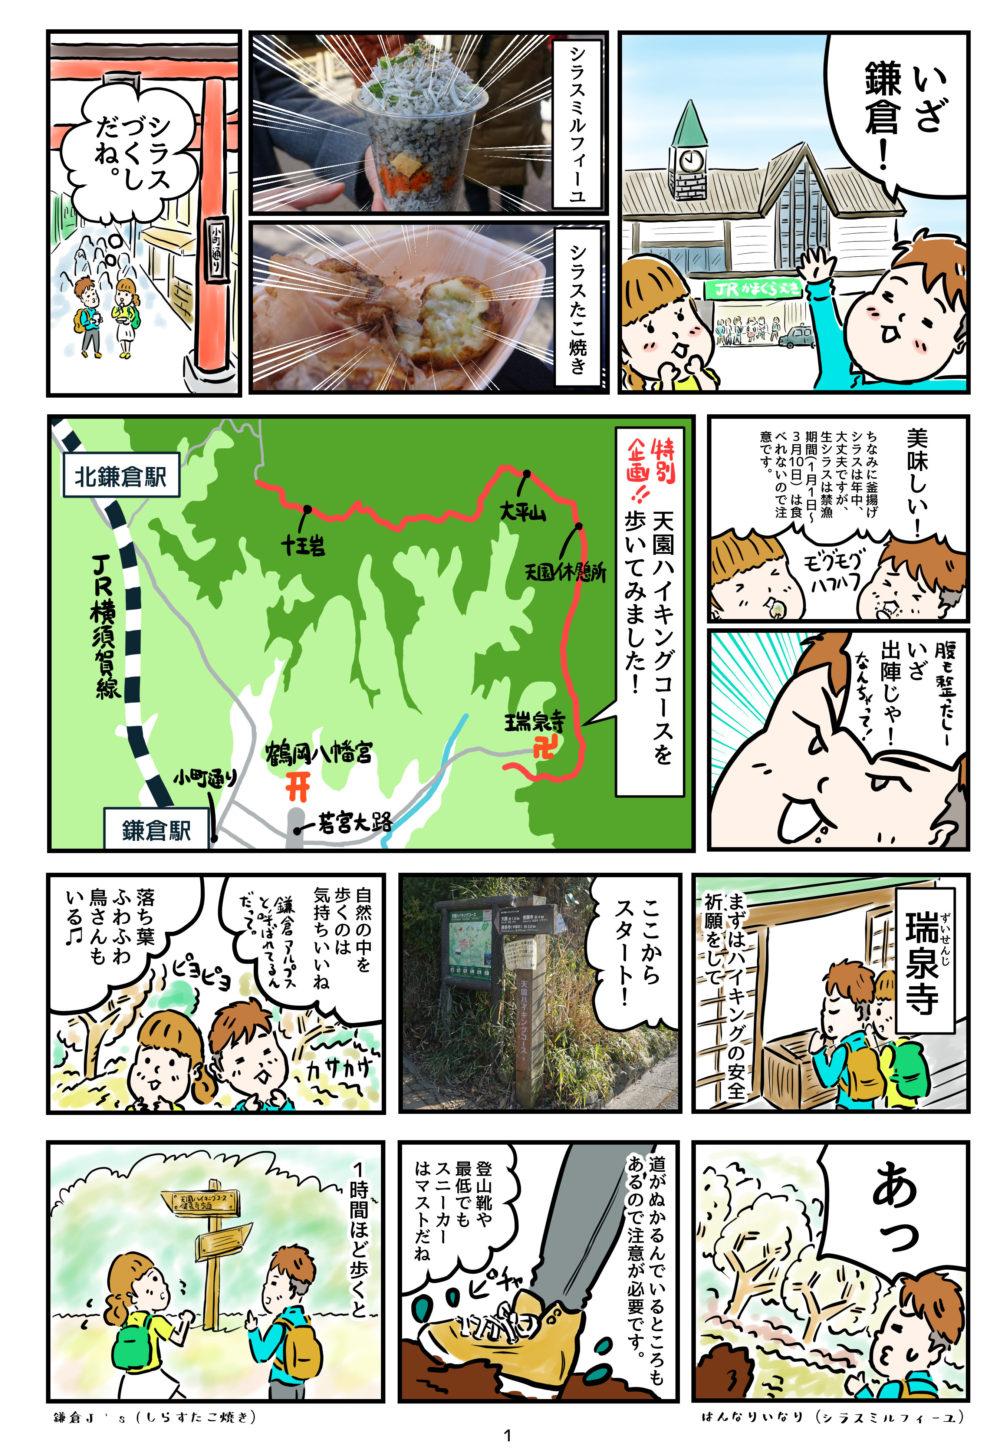 kamakura_001